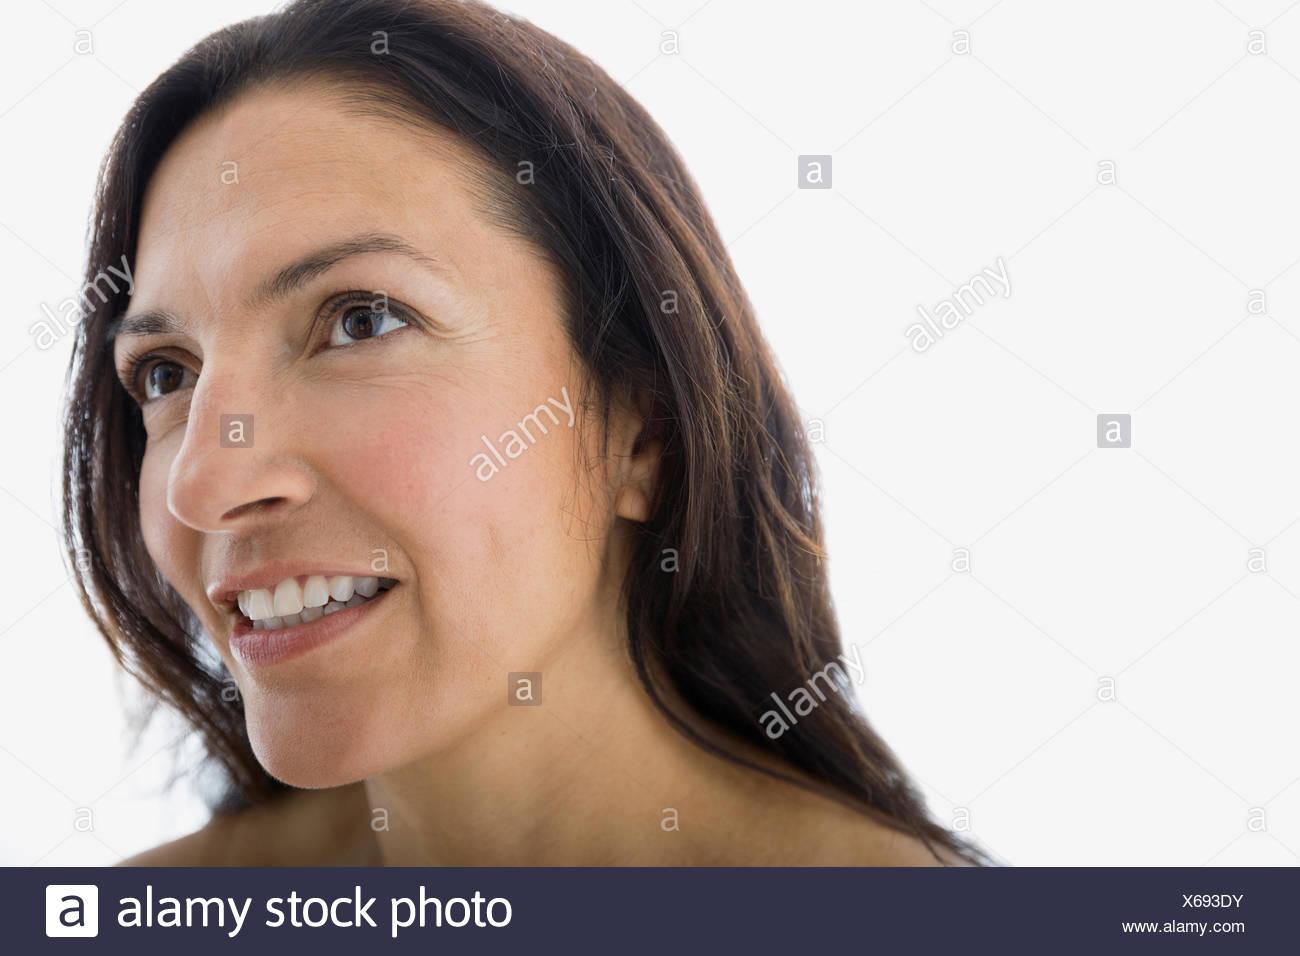 Close up portrait of smiling brunette woman Photo Stock